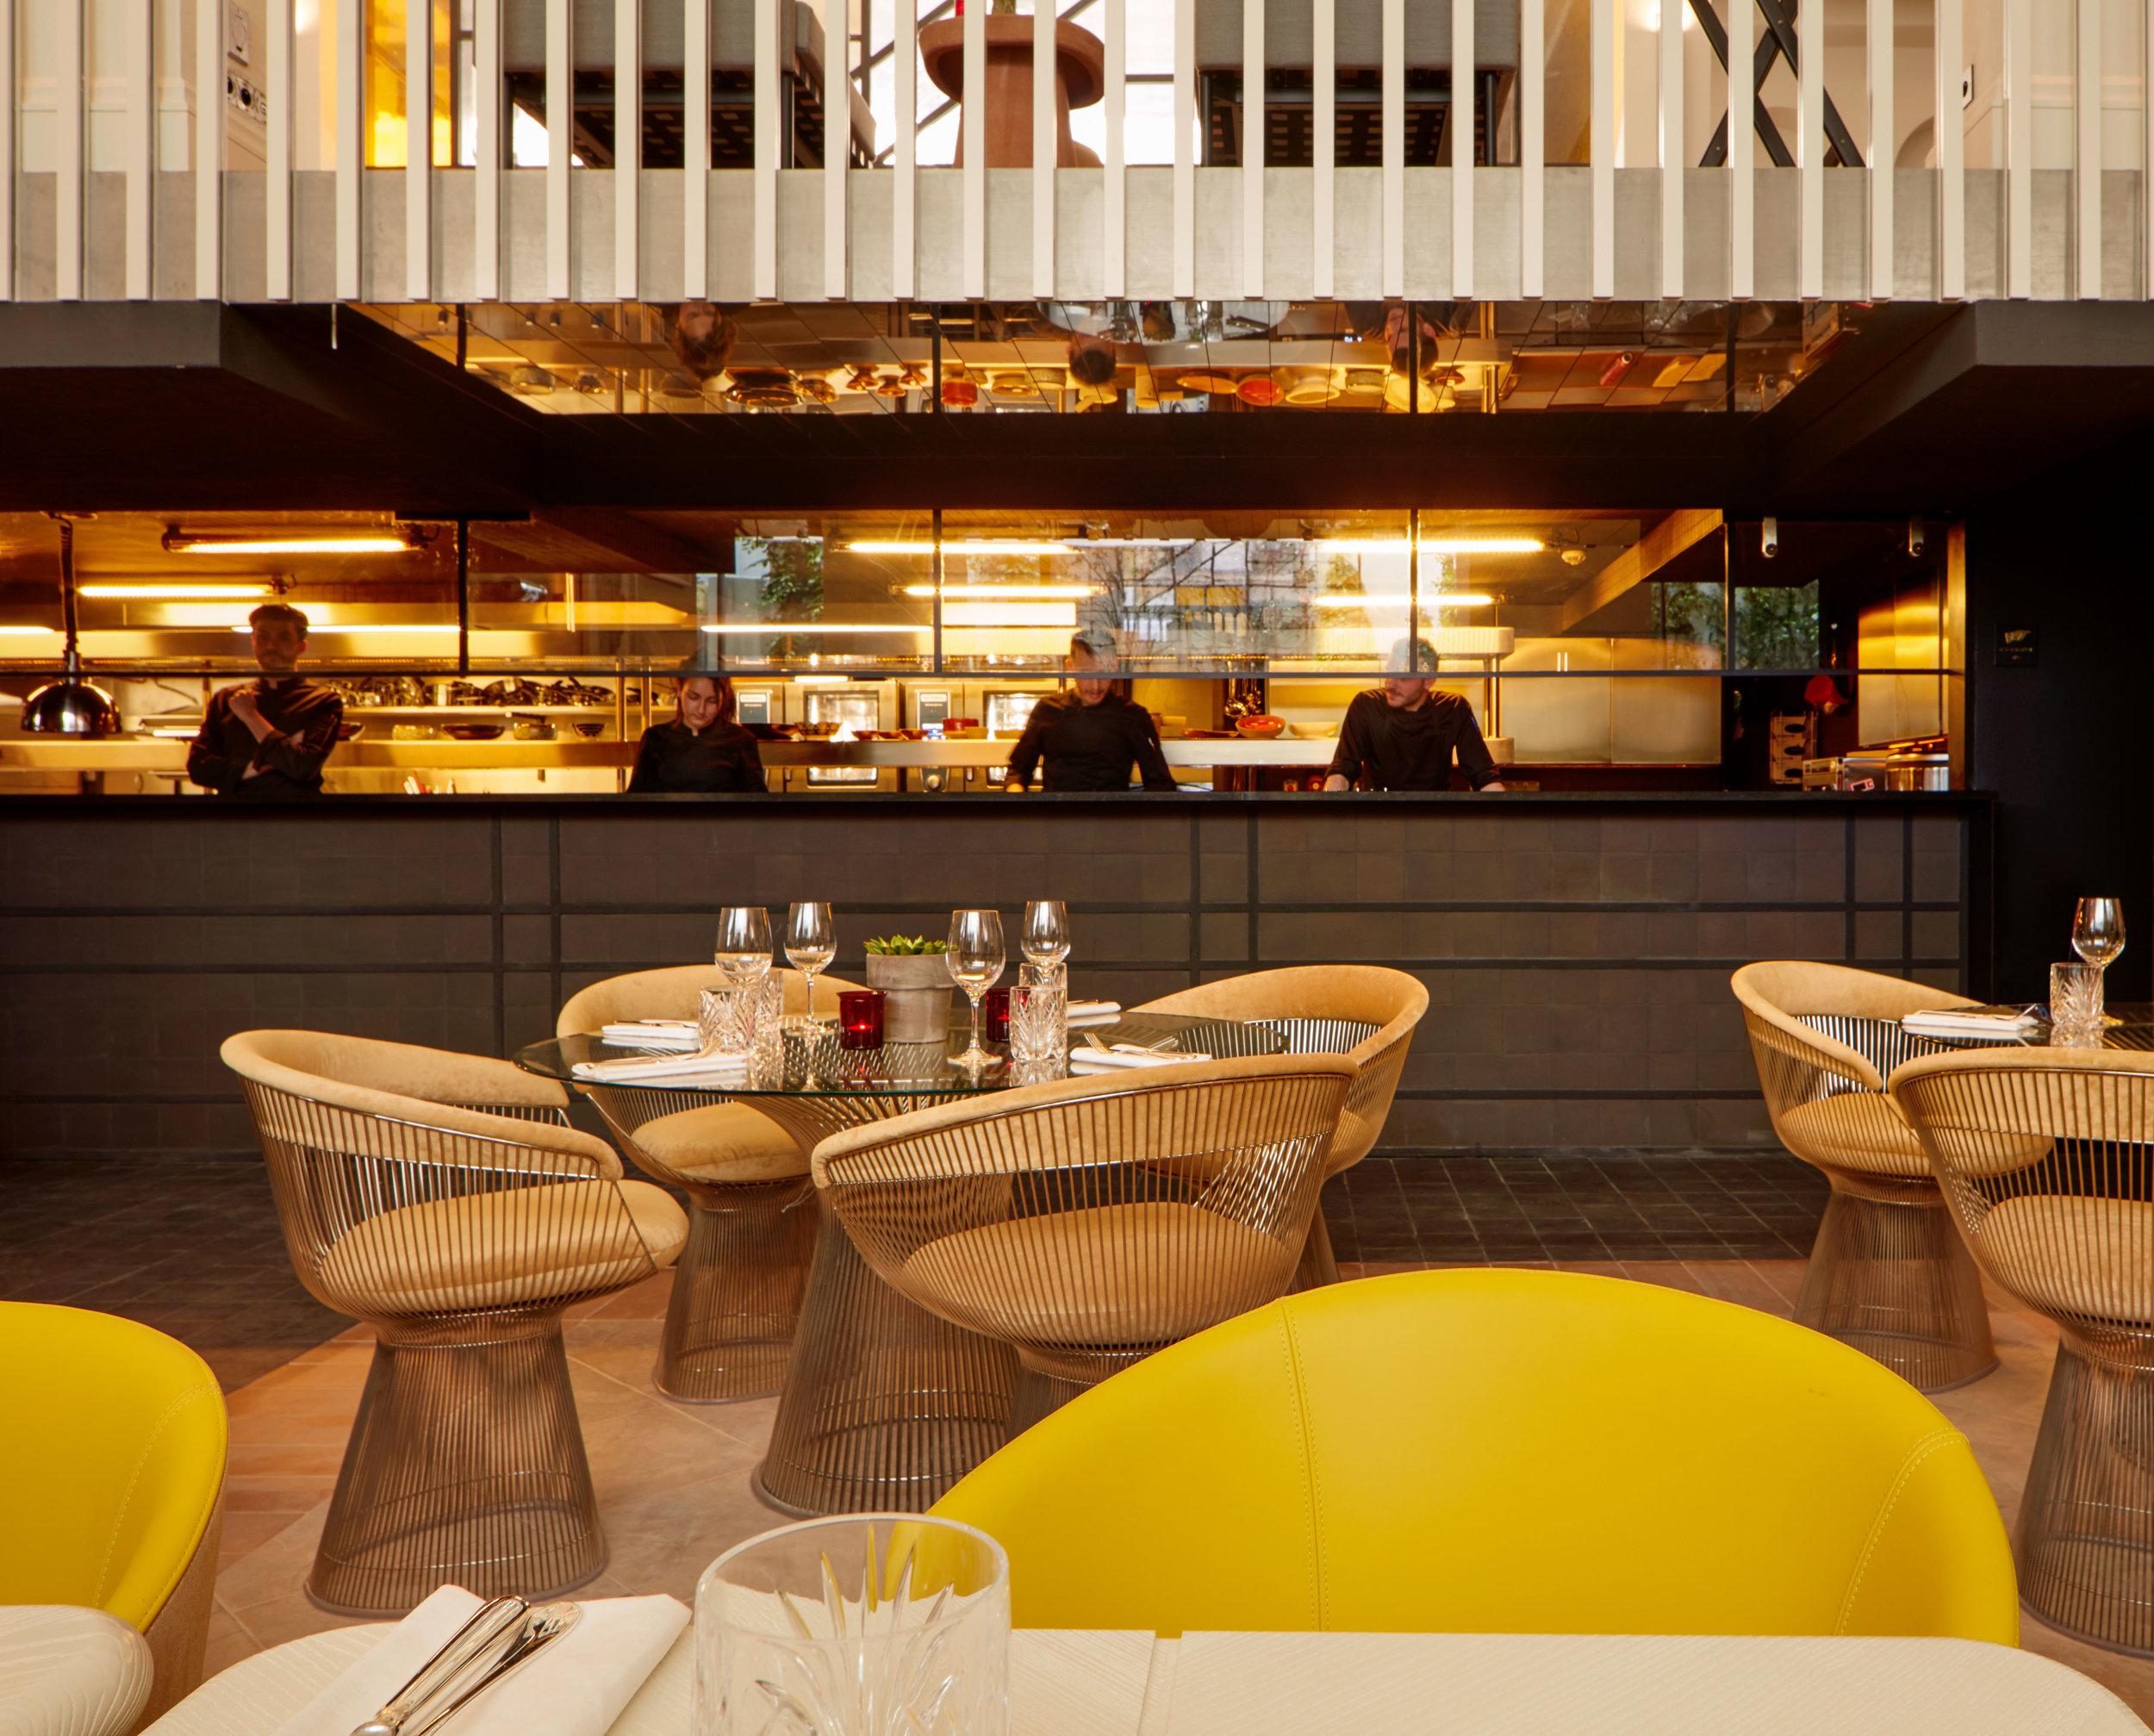 09 - Restaurant_Nicolas_Receveur.jpg